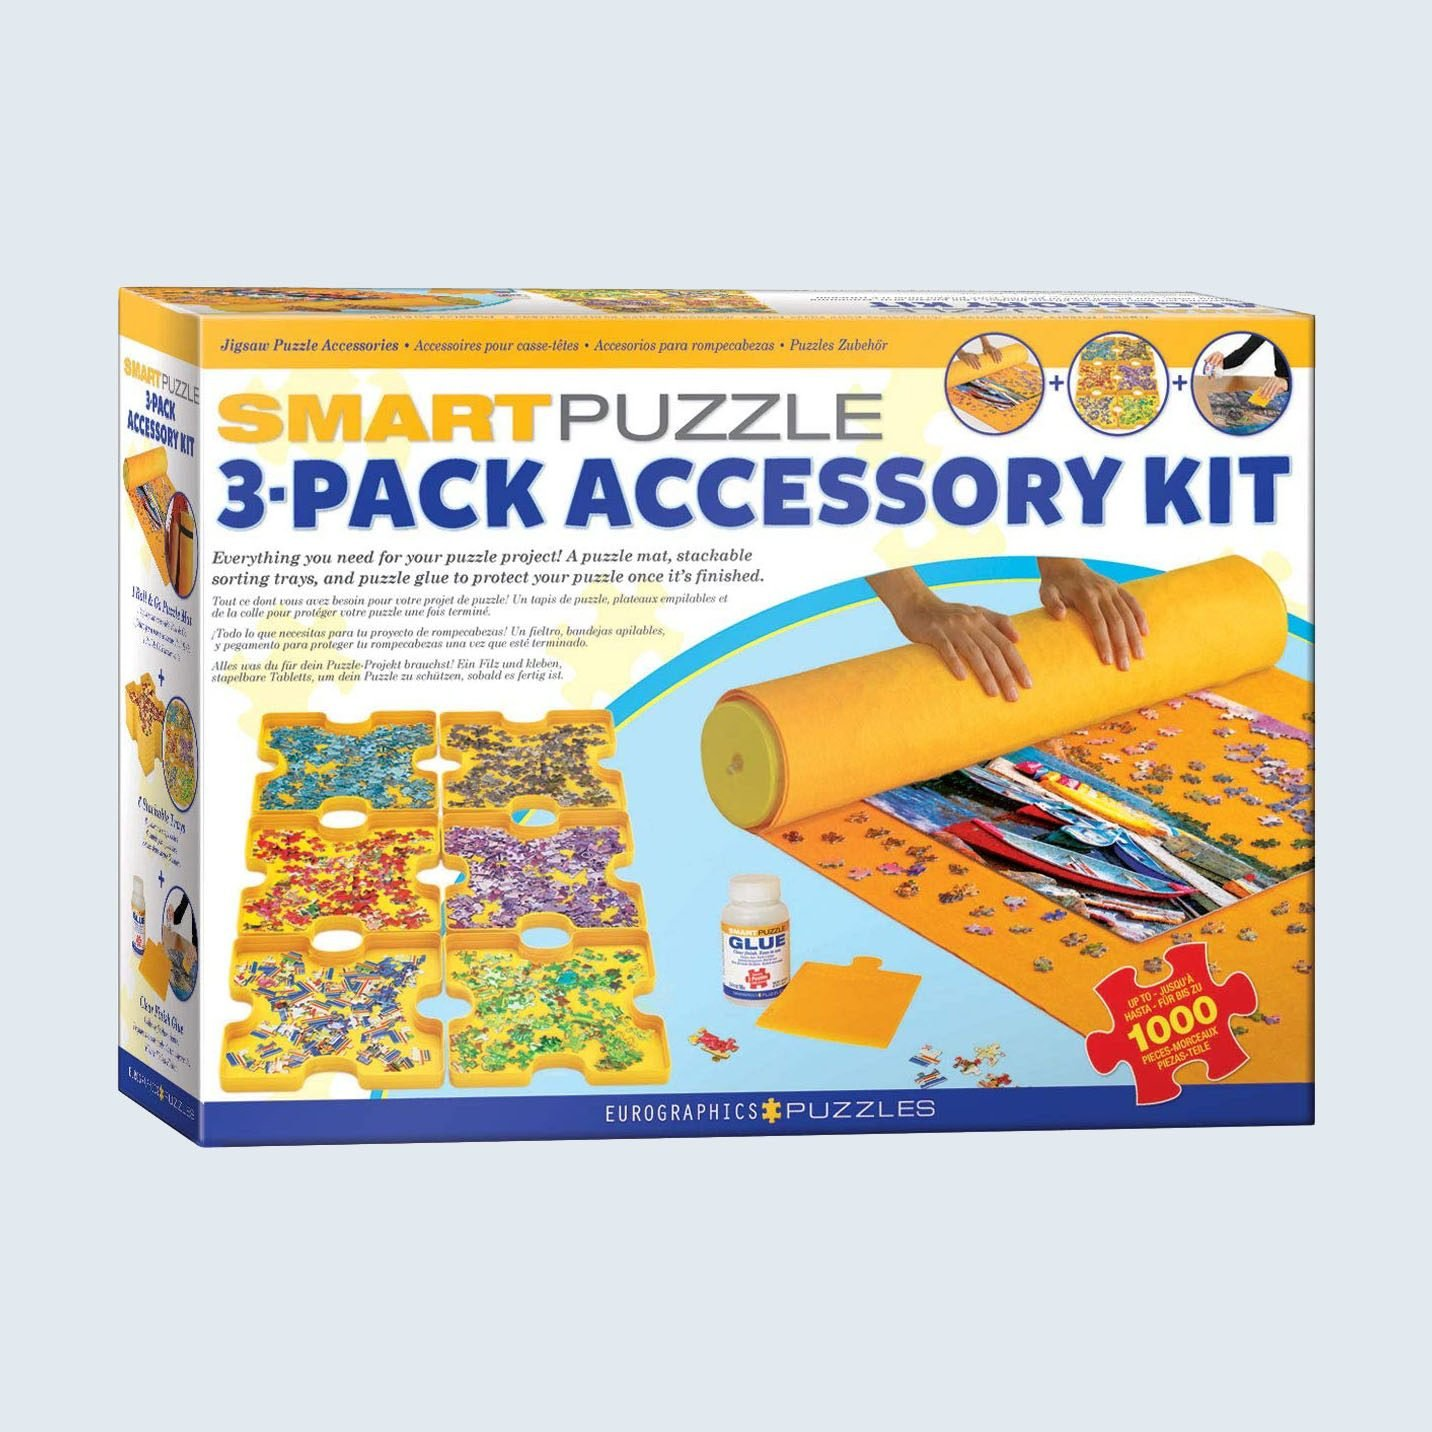 Eurographics Puzzle Accessory Combo Kit